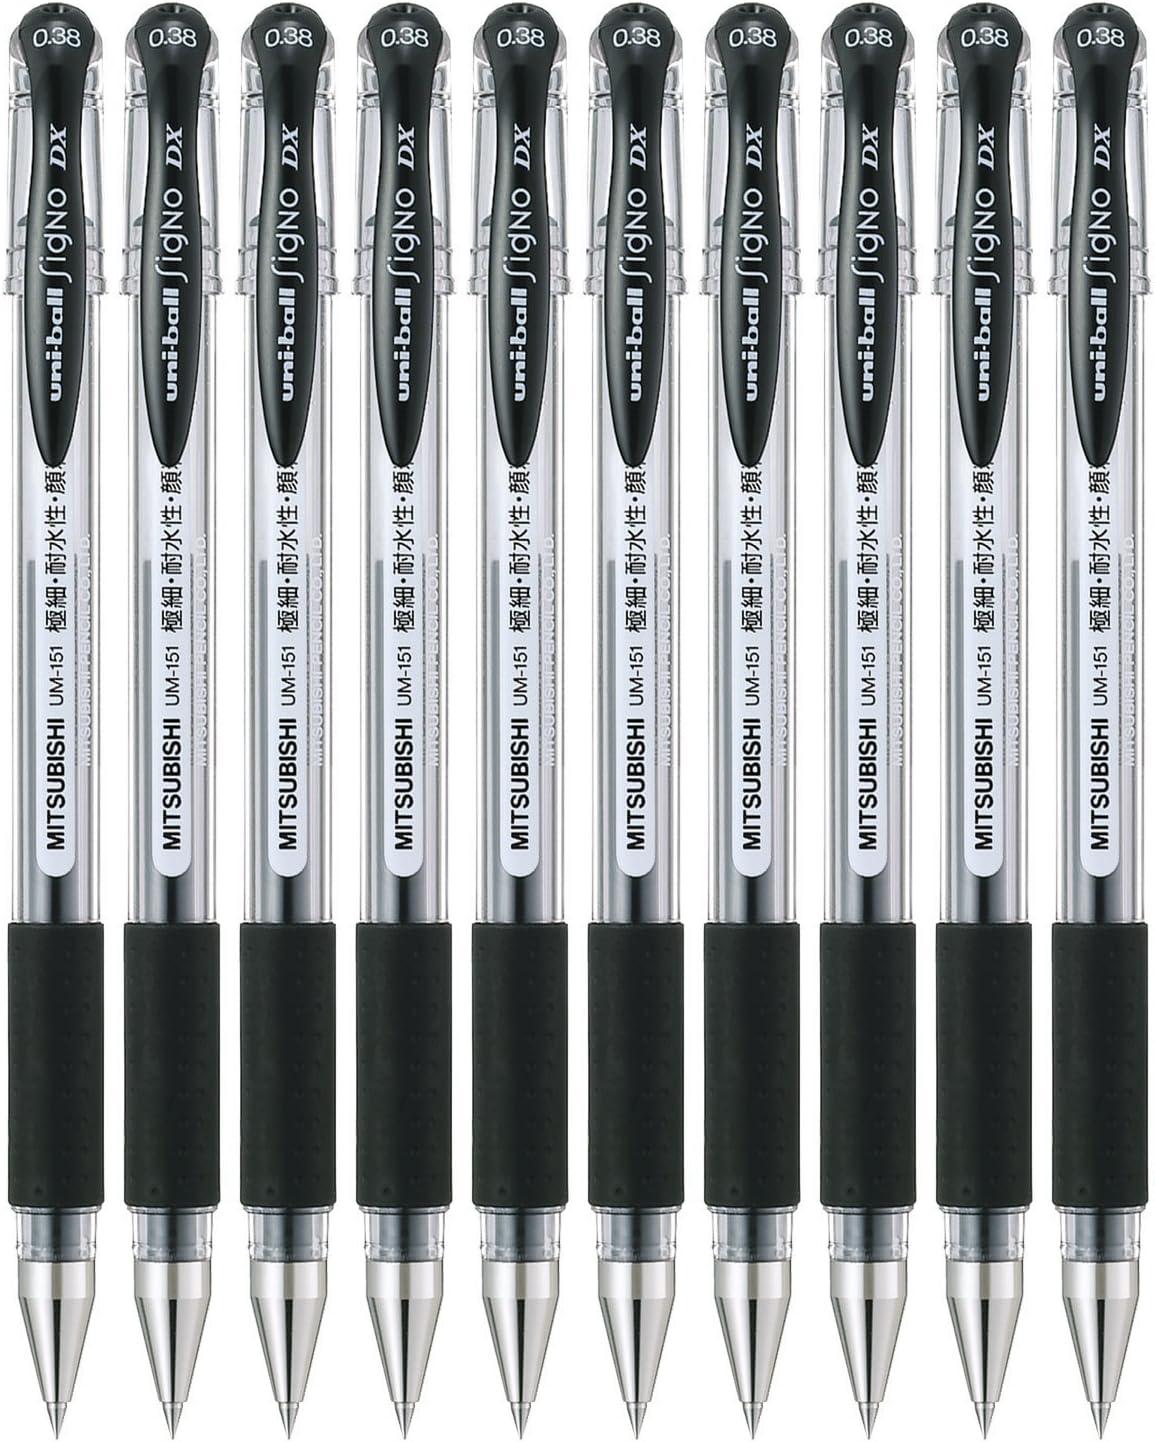 Uni-ball Signo UM-151 Black Pens 0.38mm Uniball Japan Mitsubishi Pen